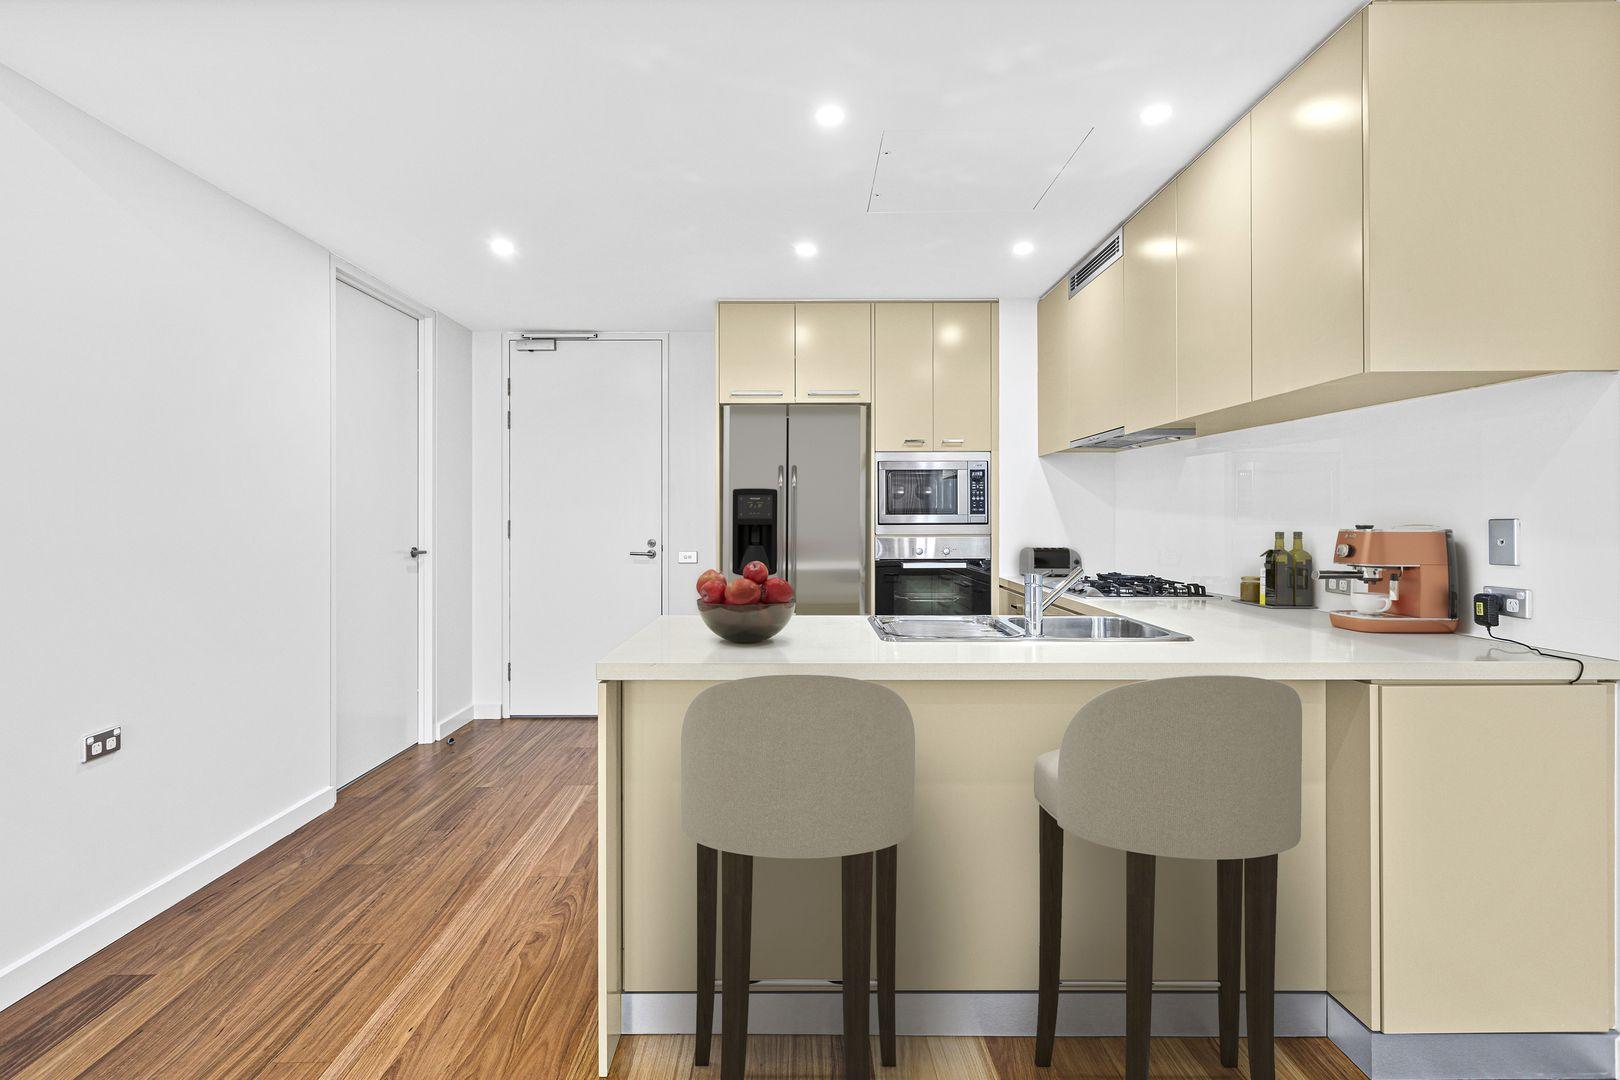 22/1 Ross Street, Wollongong NSW 2500, Image 2